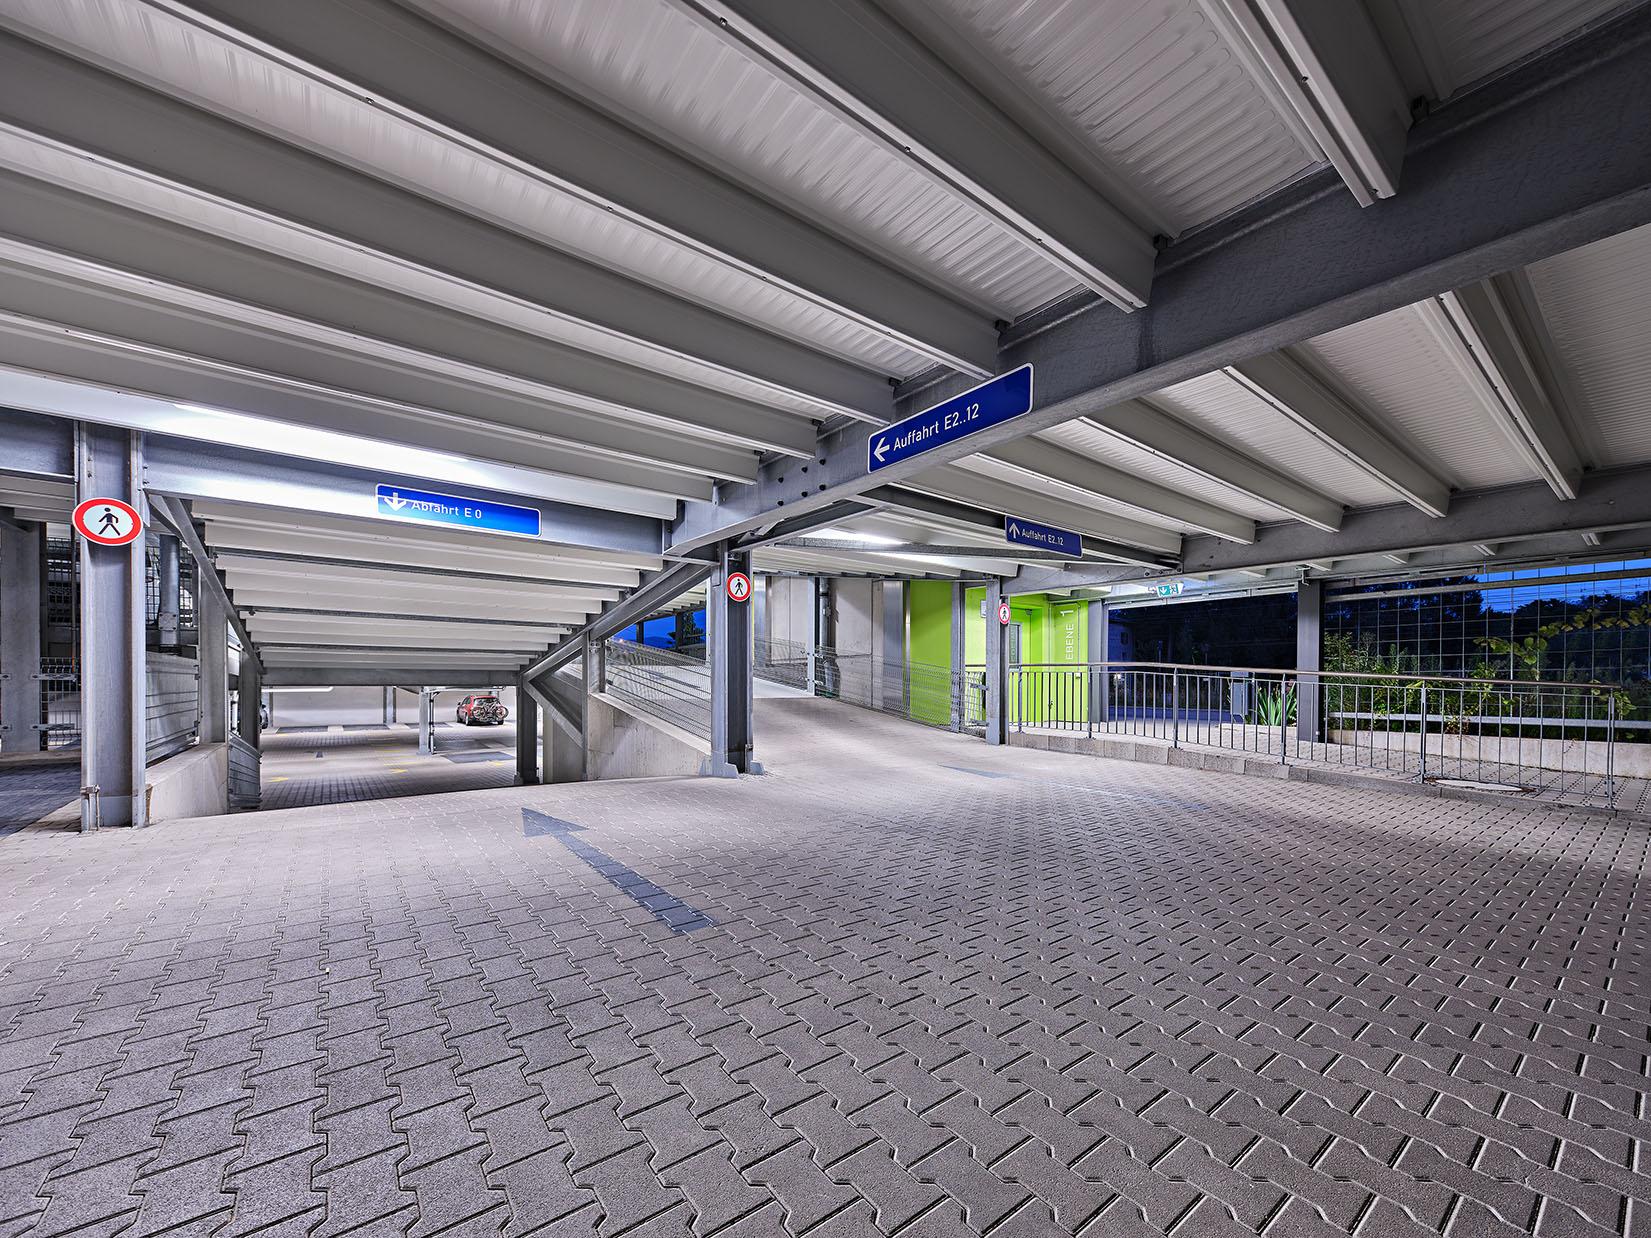 2020_07_20_HIB_Parkhaus_P12_Bahnhof_Nord_Rosenheim_NUM0371_1_0_rgb Kopie